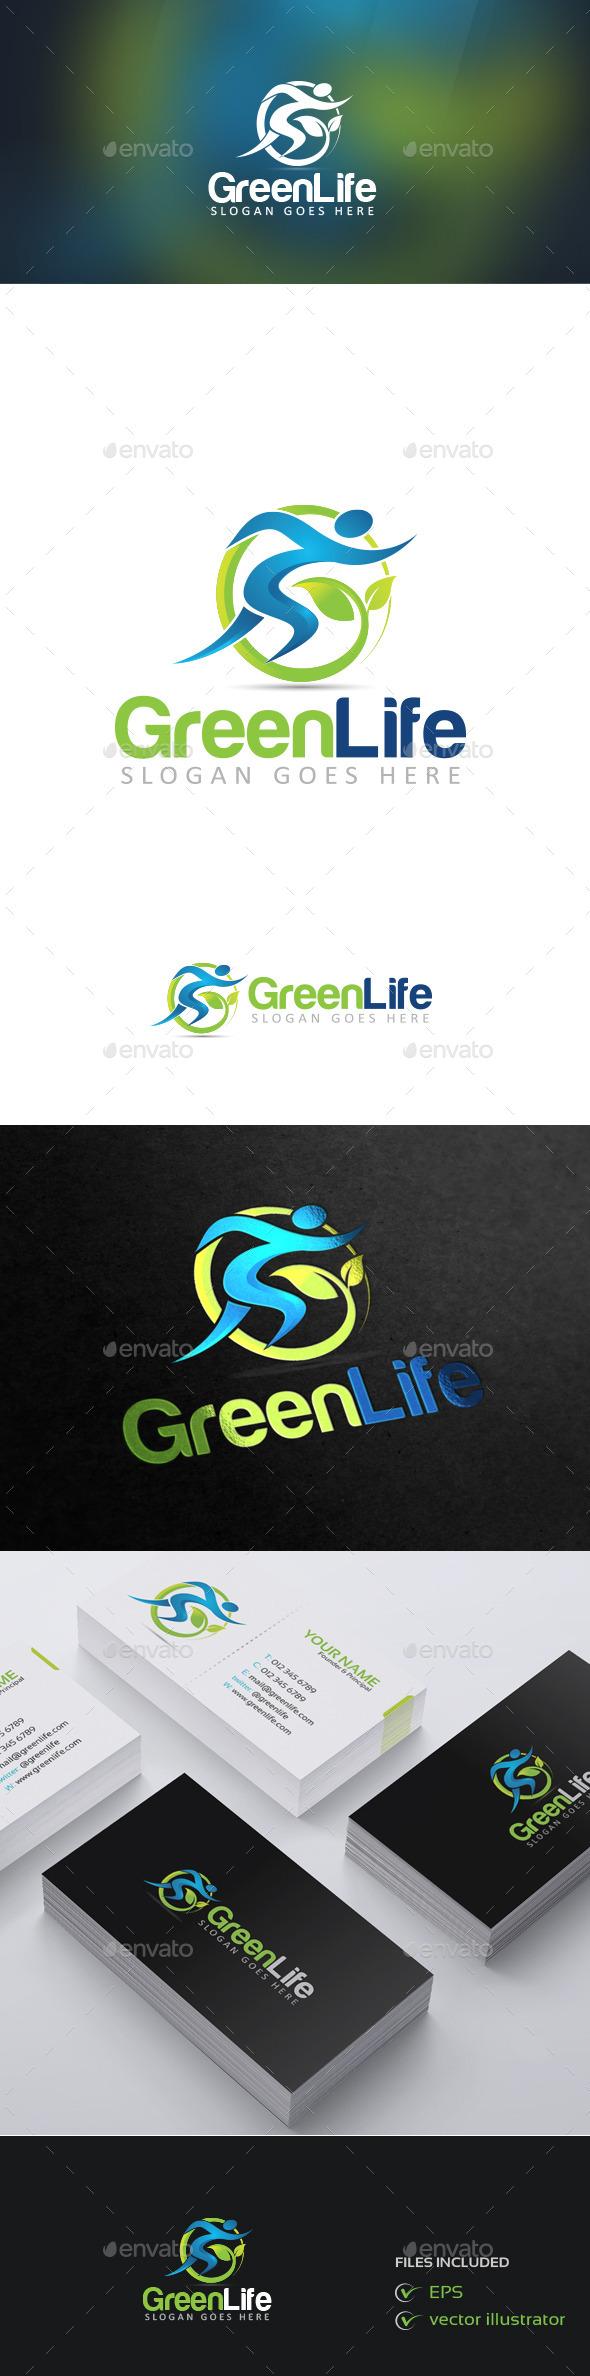 GreenLife - Nature Logo Templates